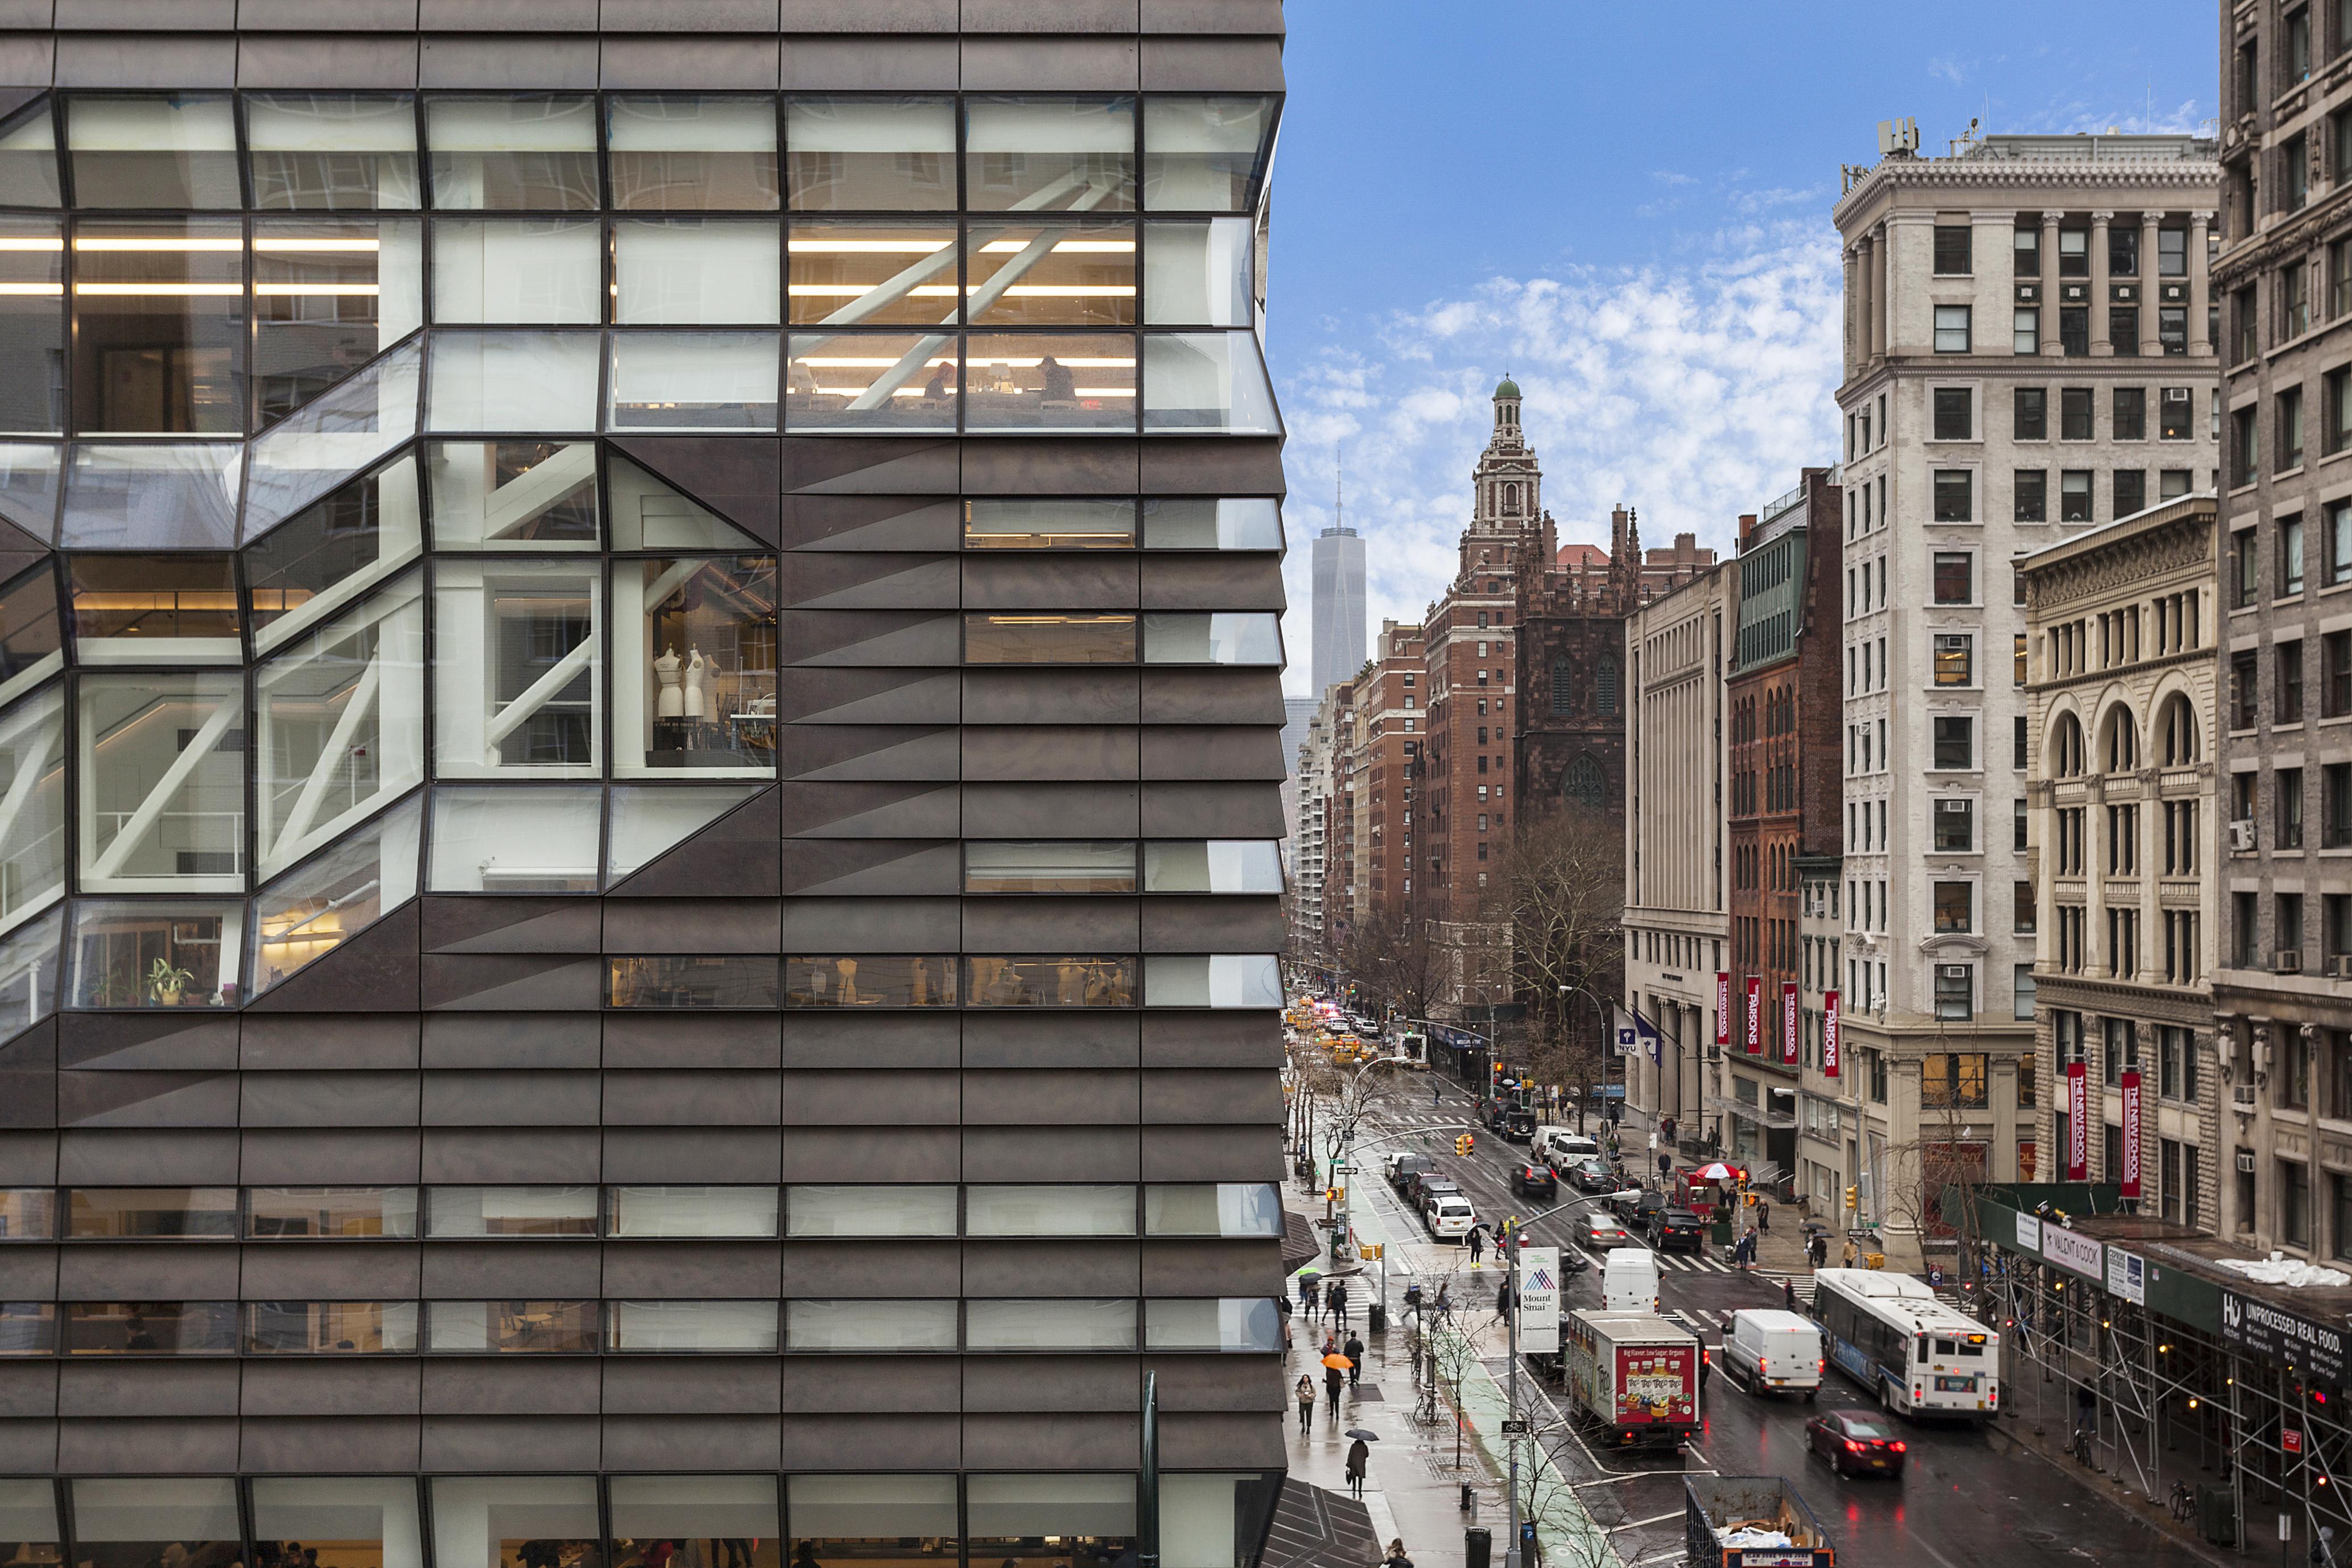 69 Fifth Avenue Greenwich Village New York NY 10003